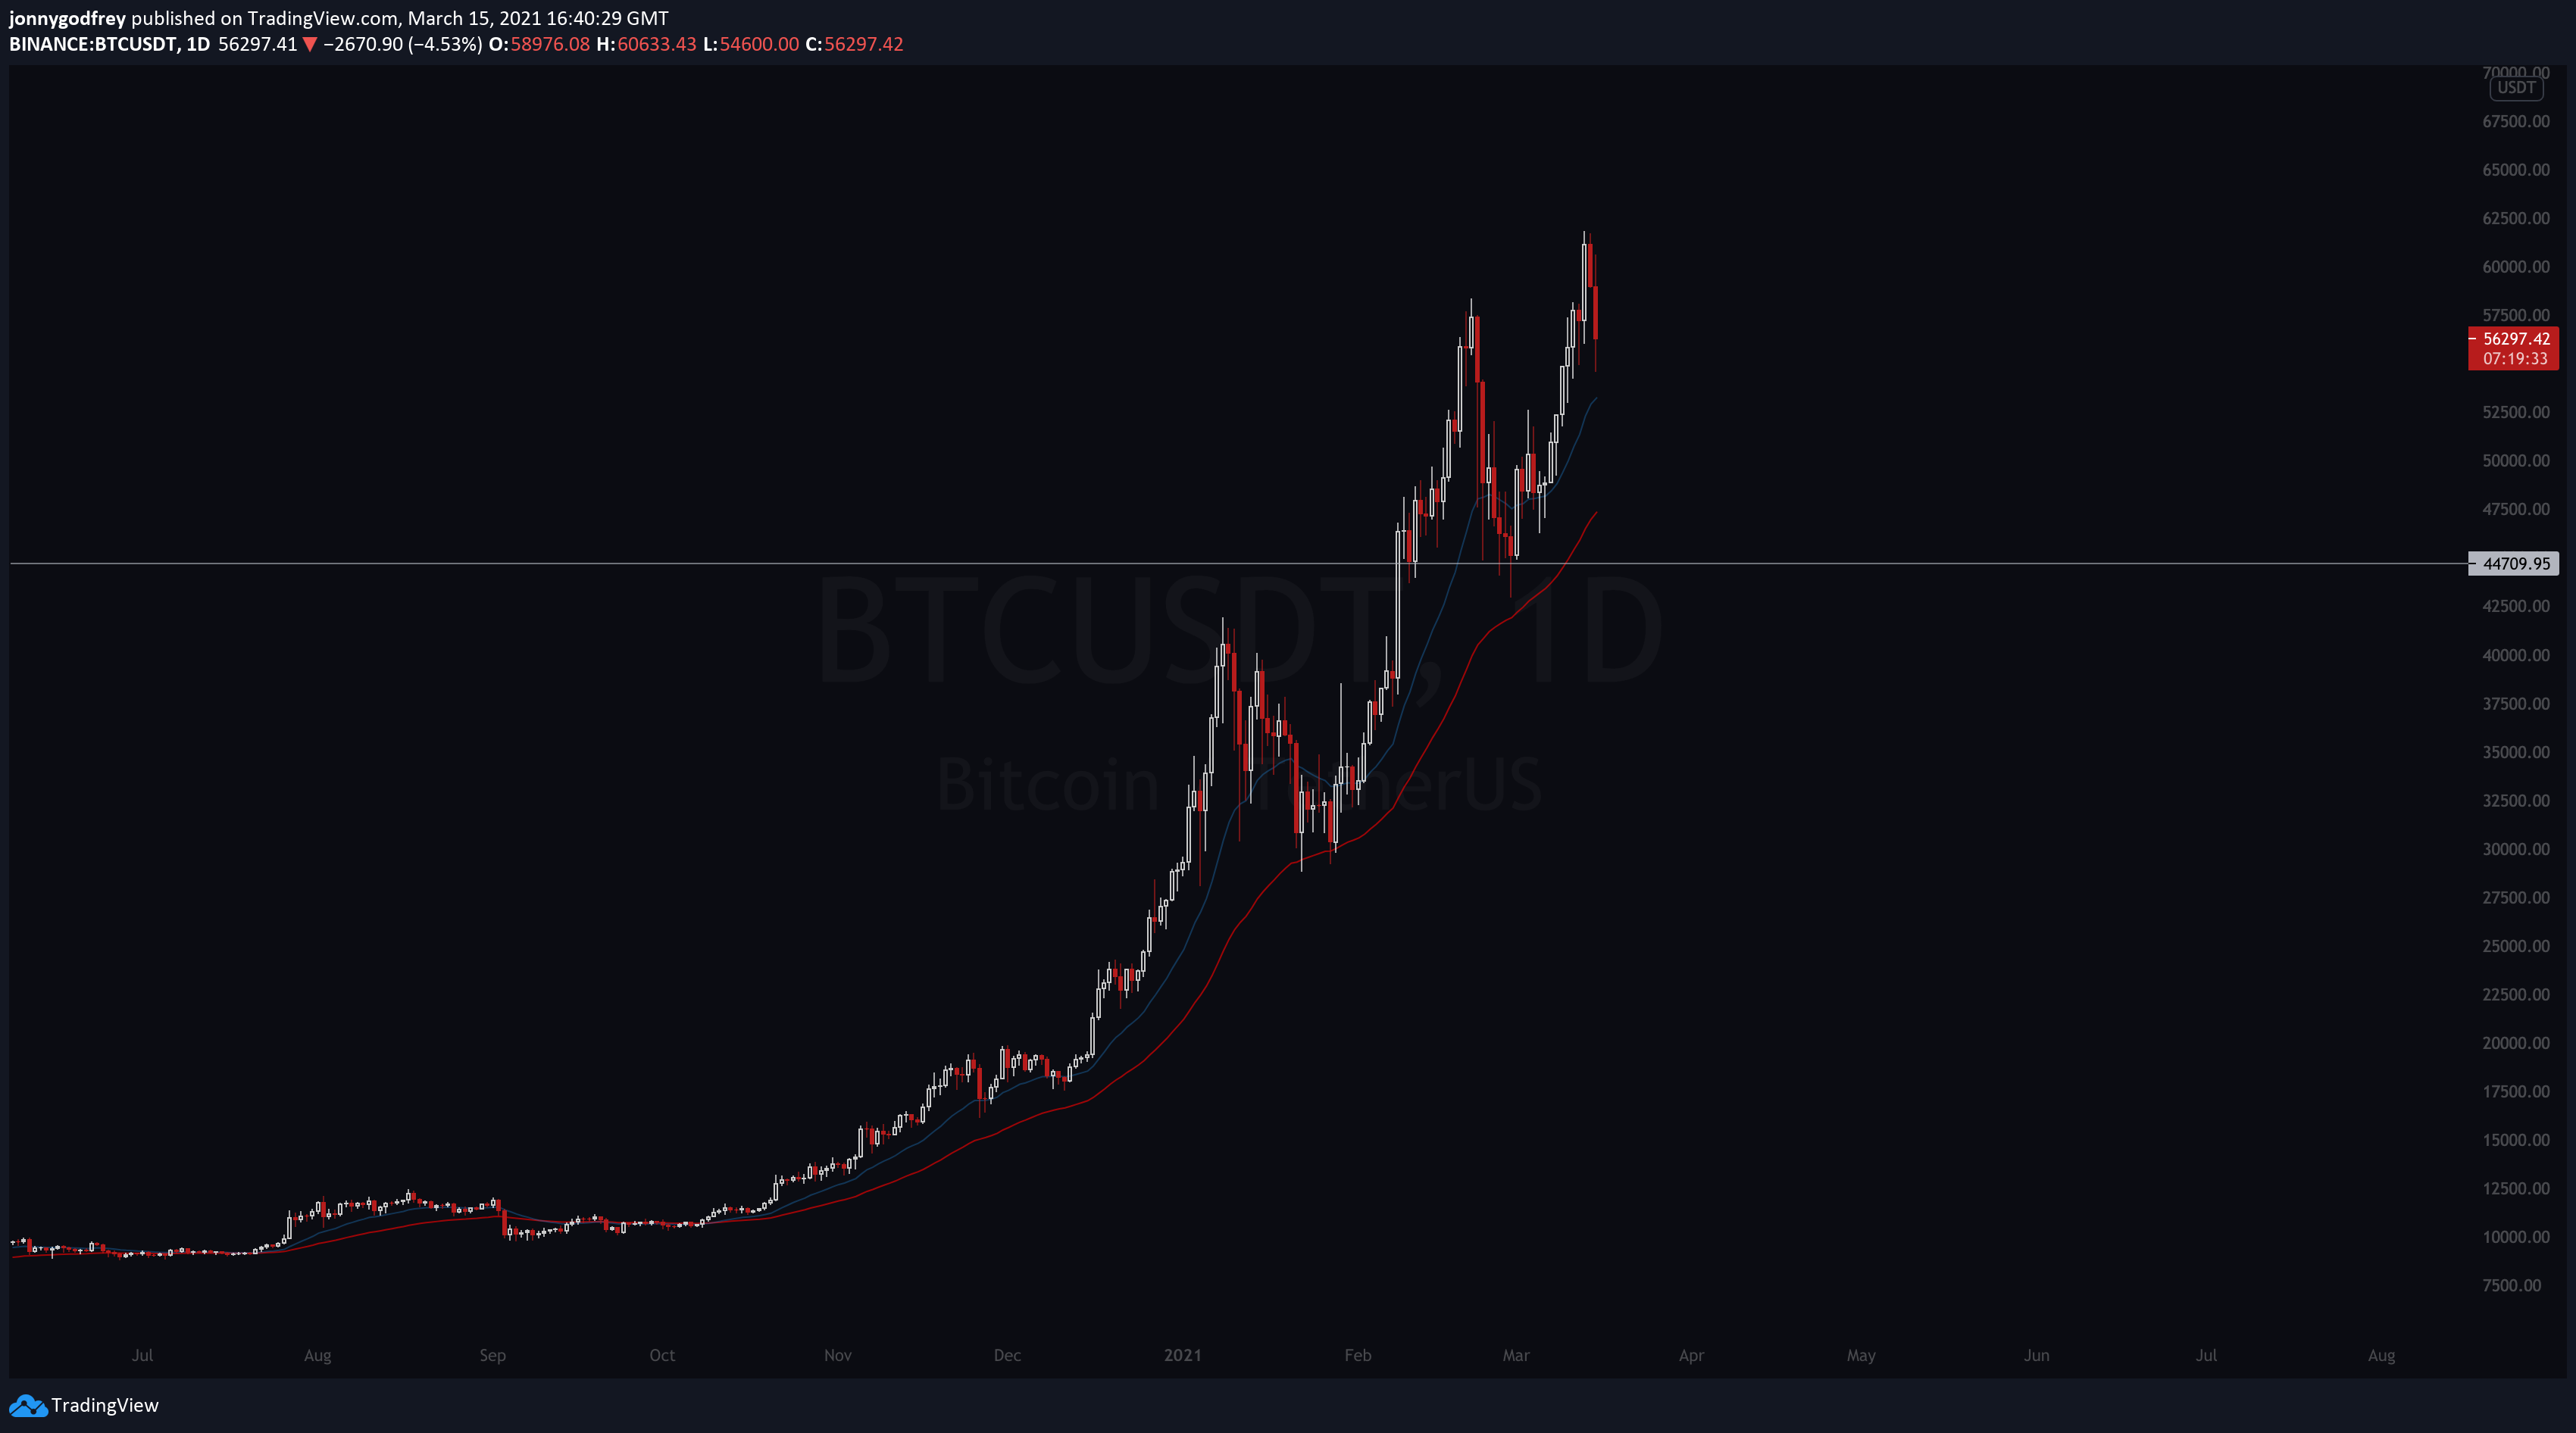 BTCUSD daily chart